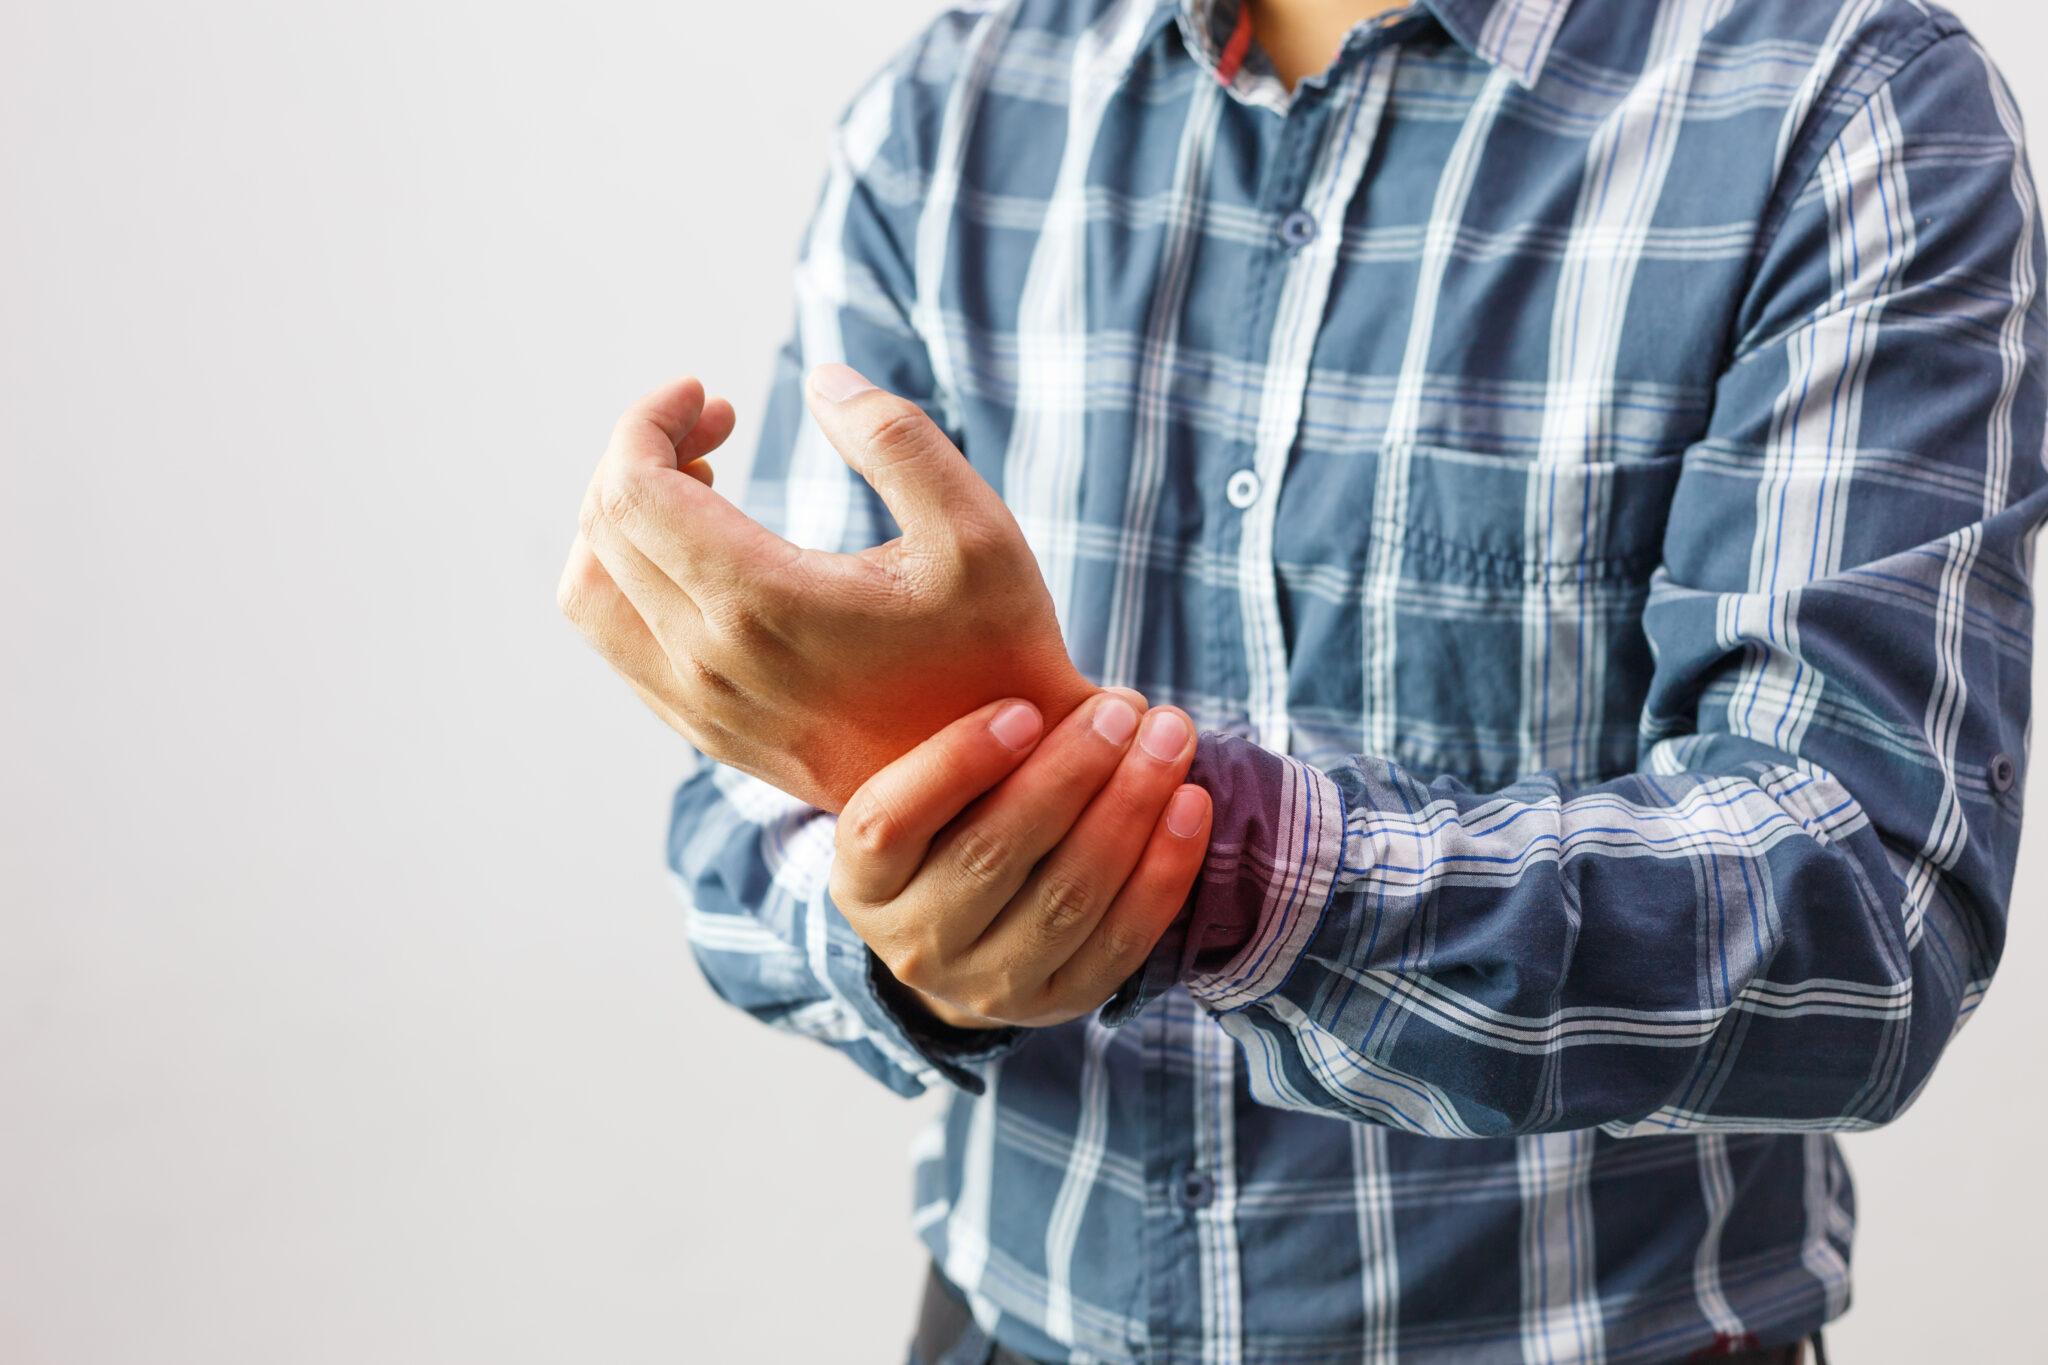 GUM DISEASE BACTERIA AND RHEUMATOID ARTHRITIS